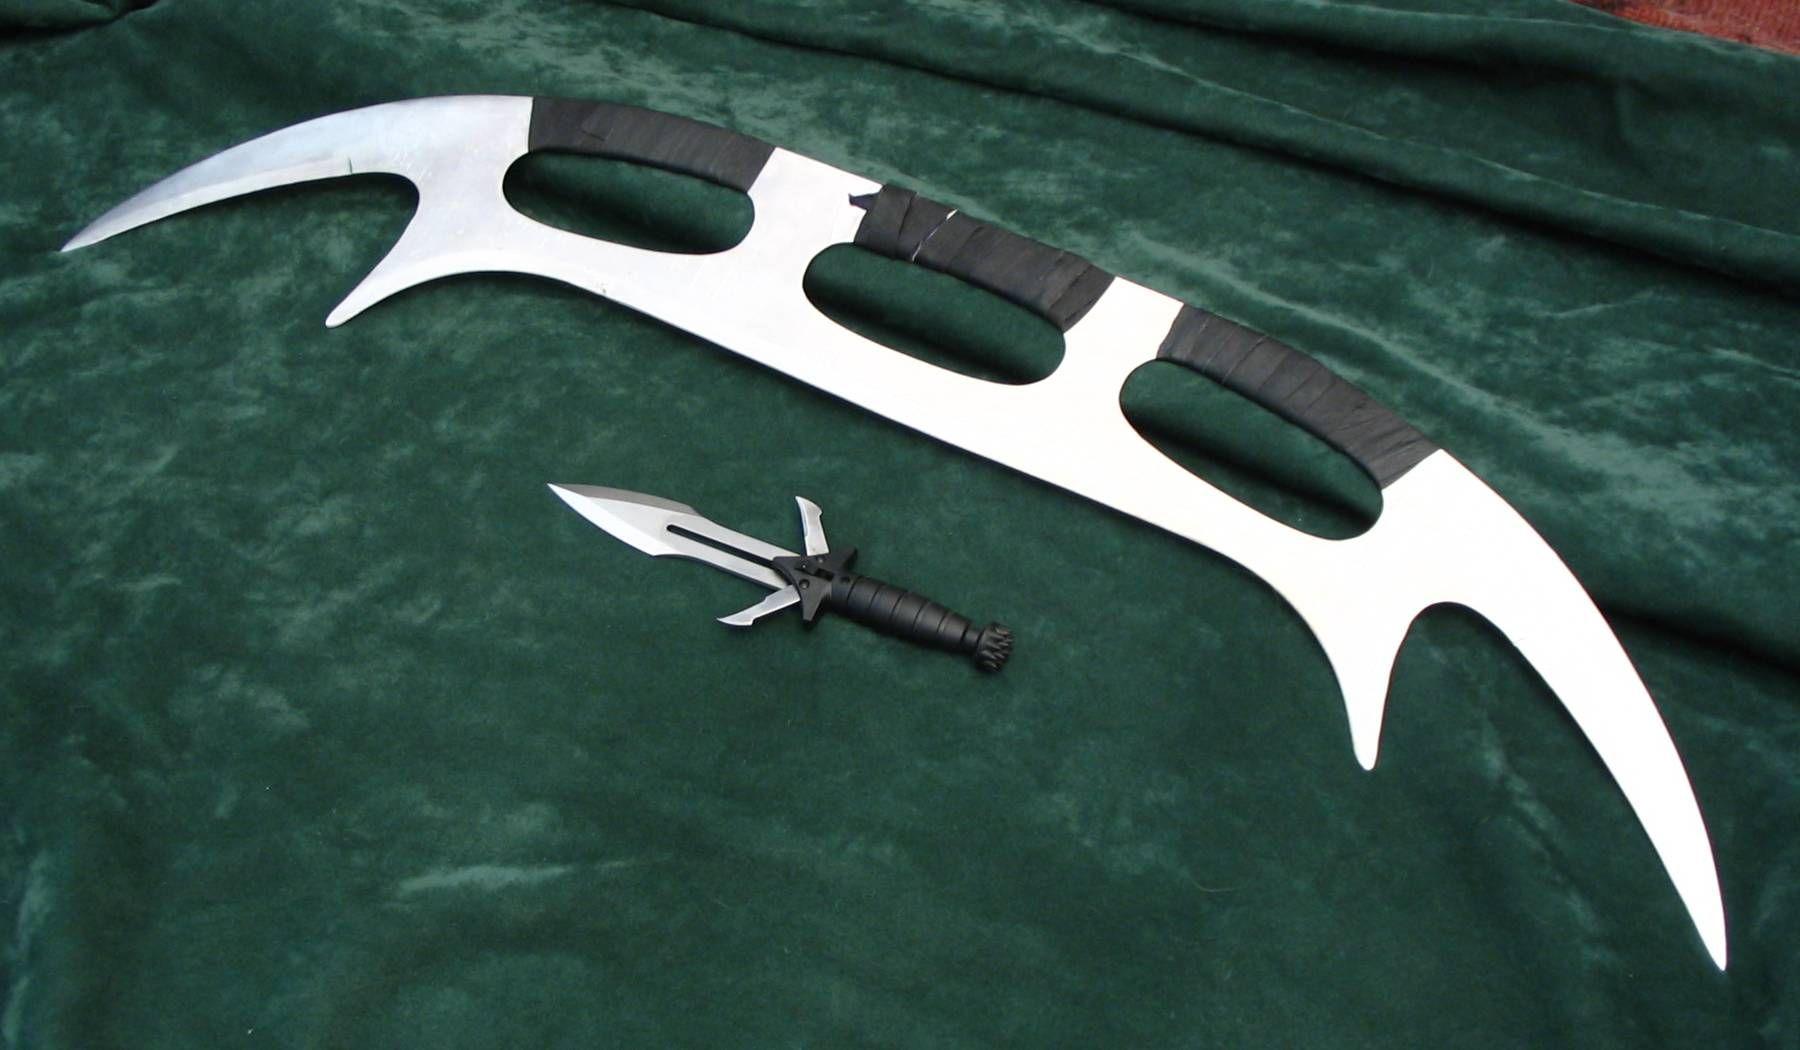 Klingon Bat'leth Sword Wall Display: 8 Steps